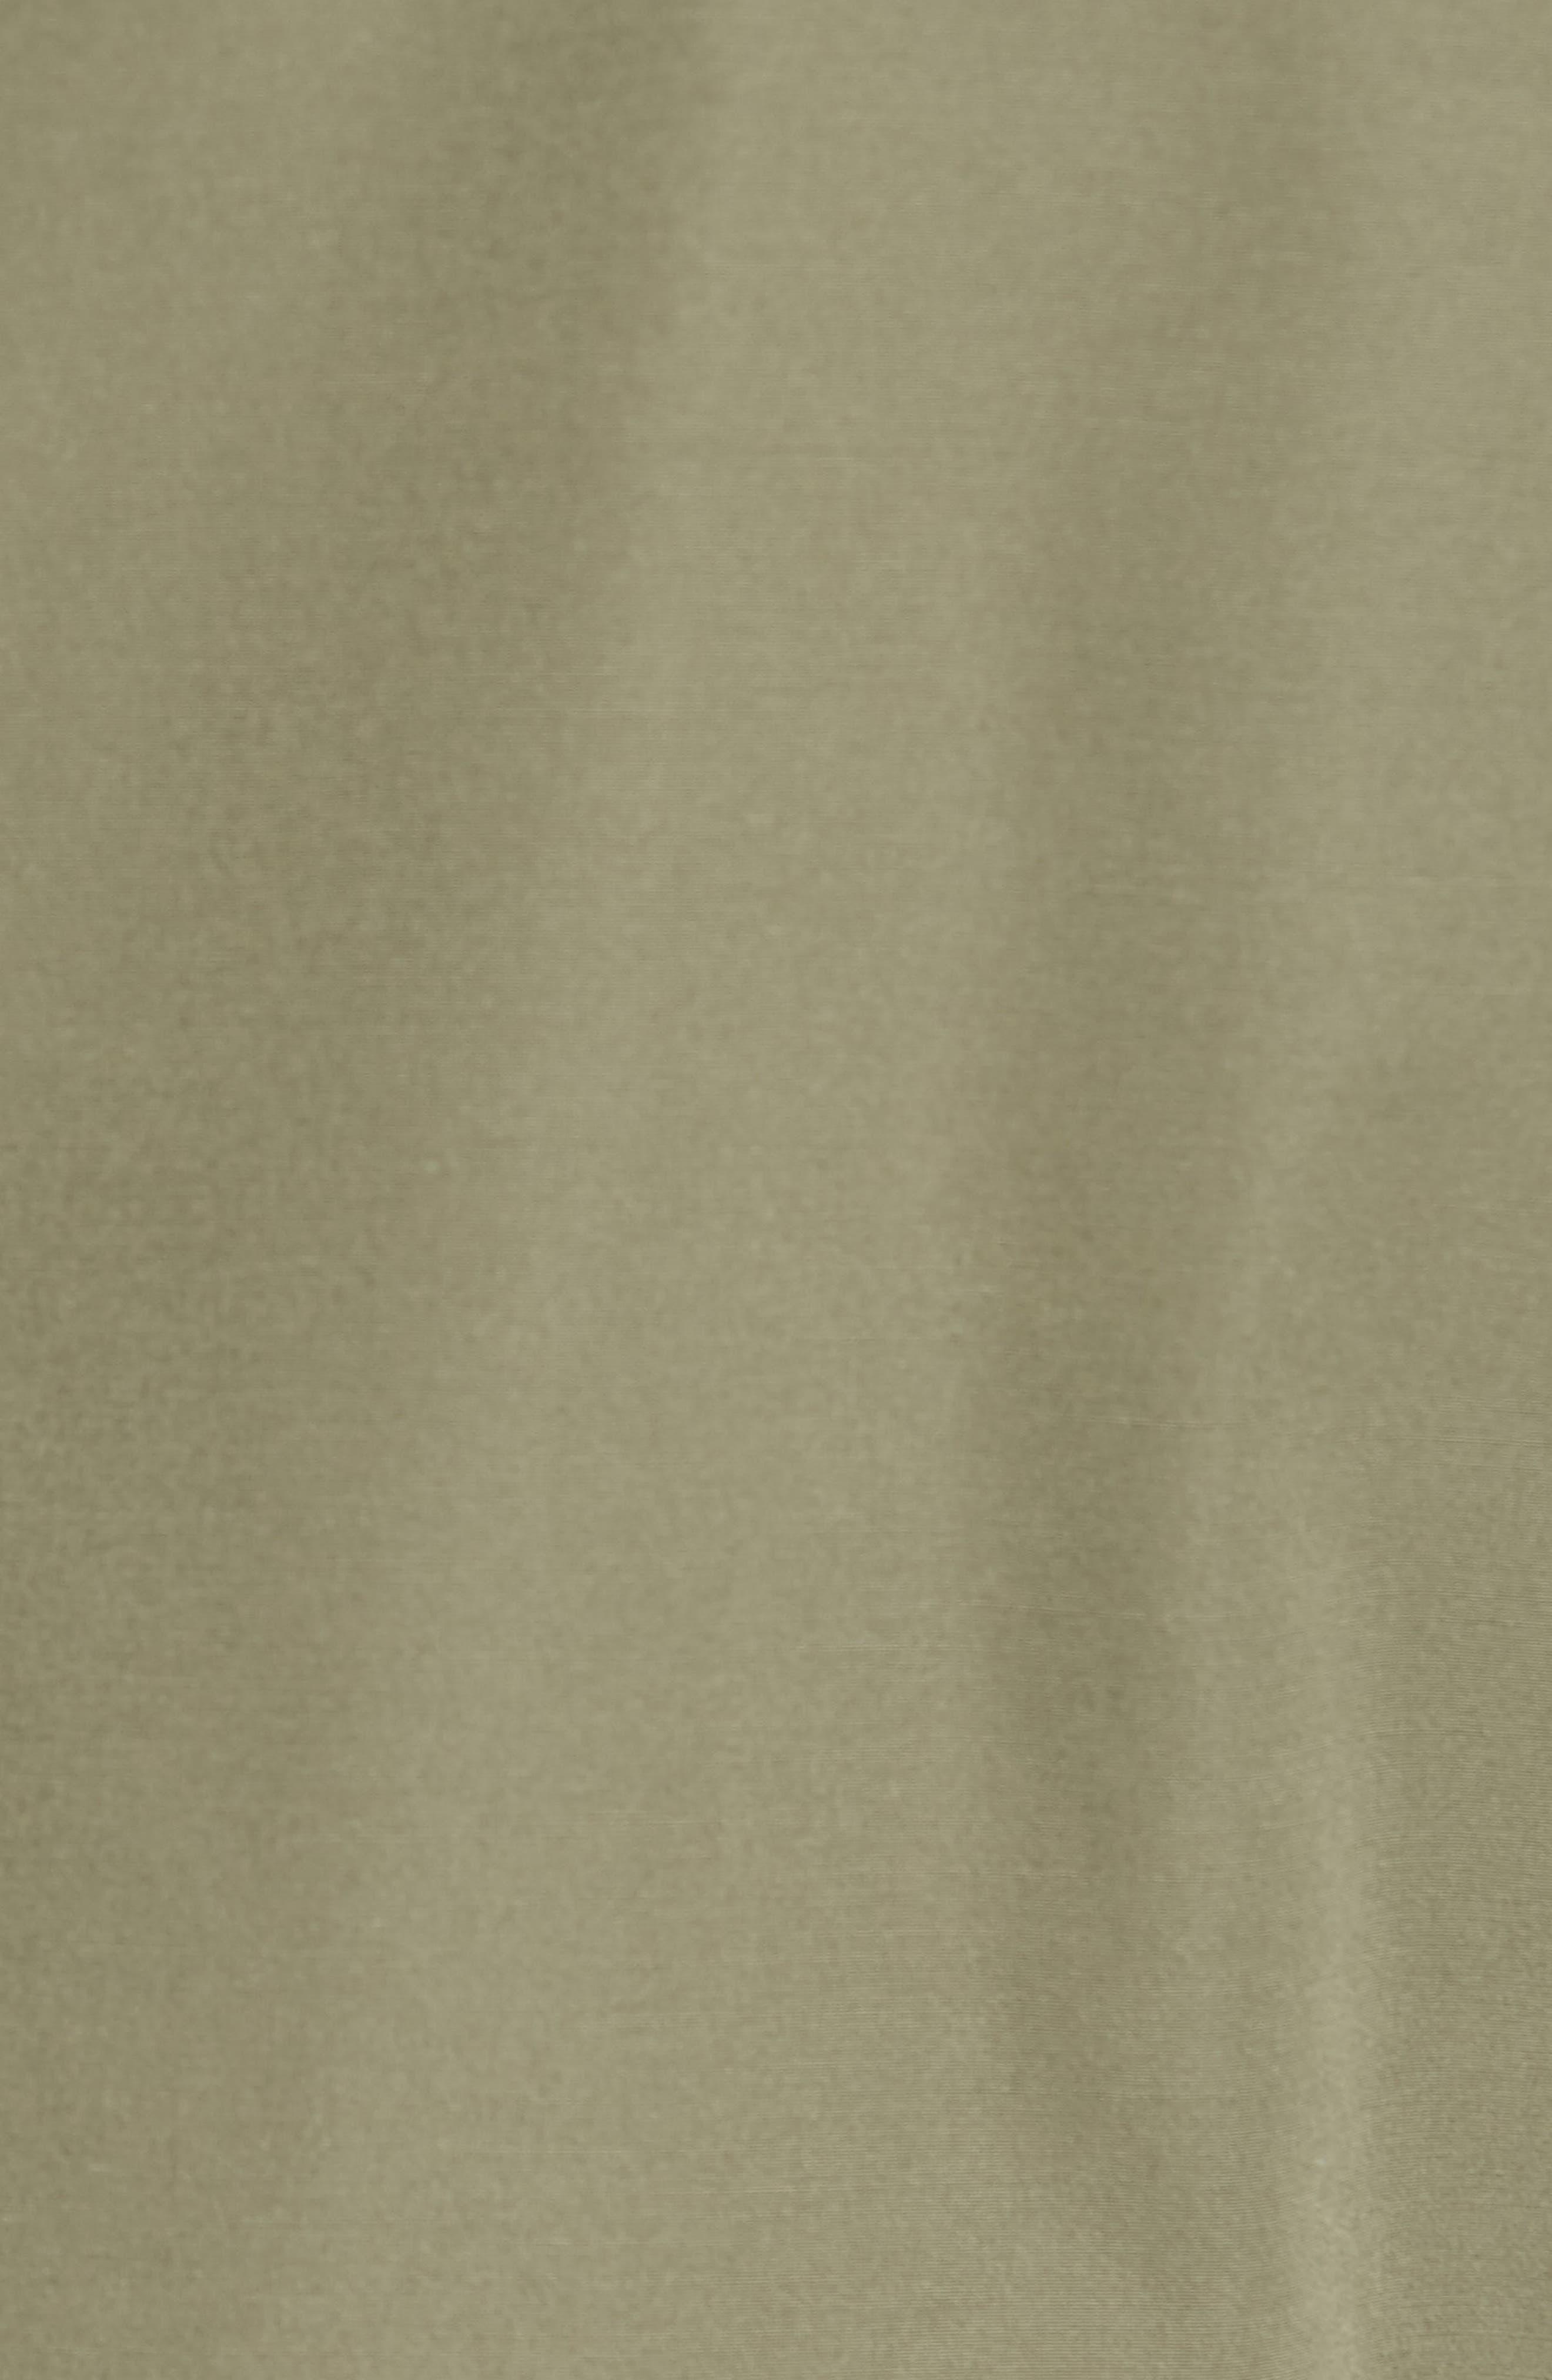 Water-Repellent Zip Front Jacket,                             Alternate thumbnail 6, color,                             374